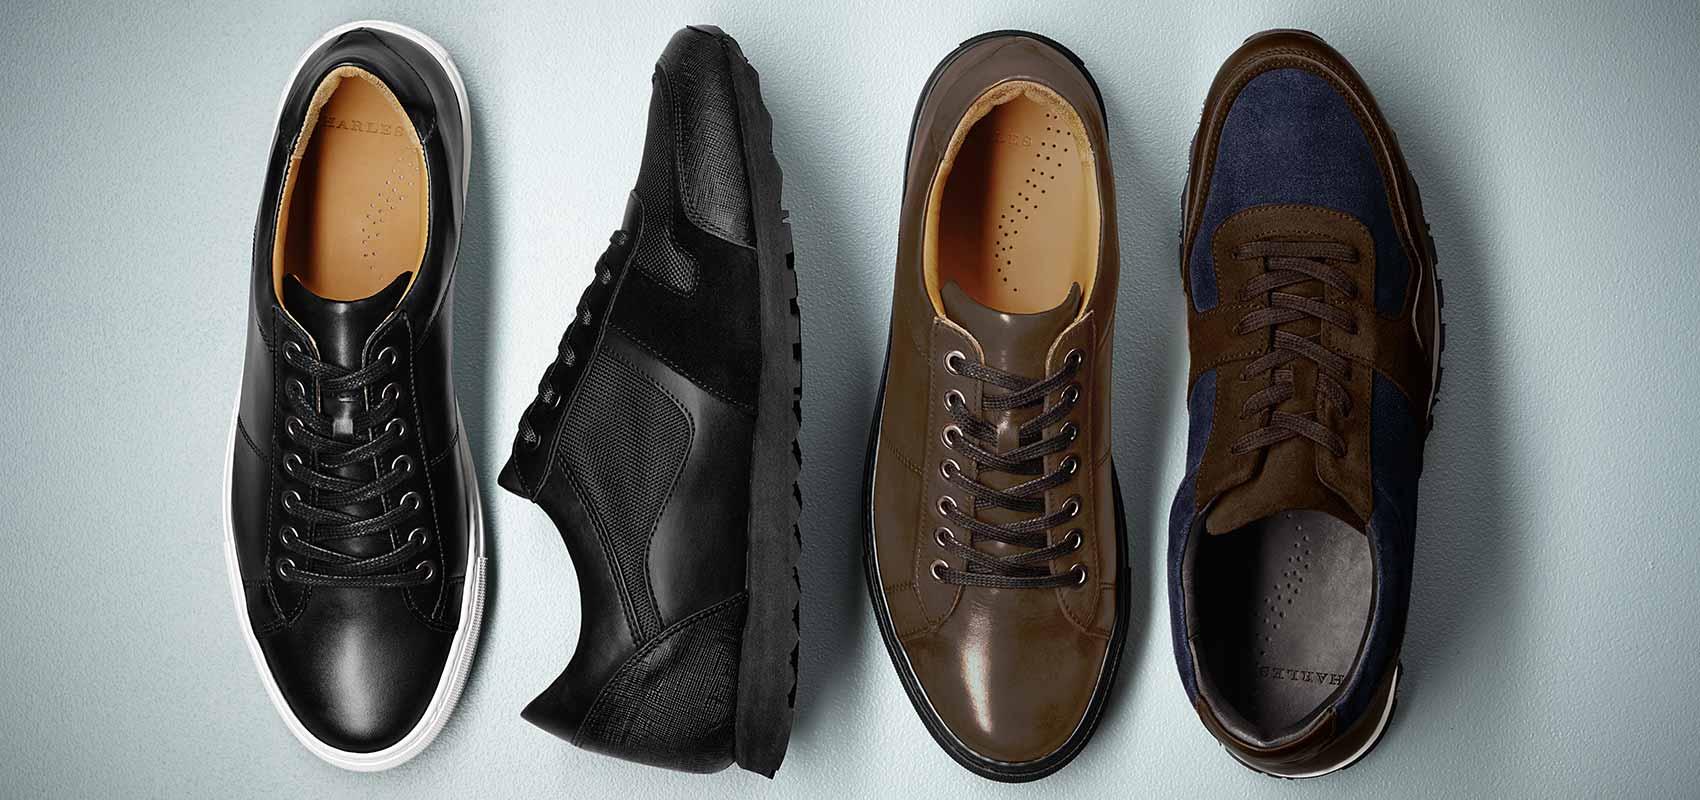 Charles Tyrwhitt casual shoes